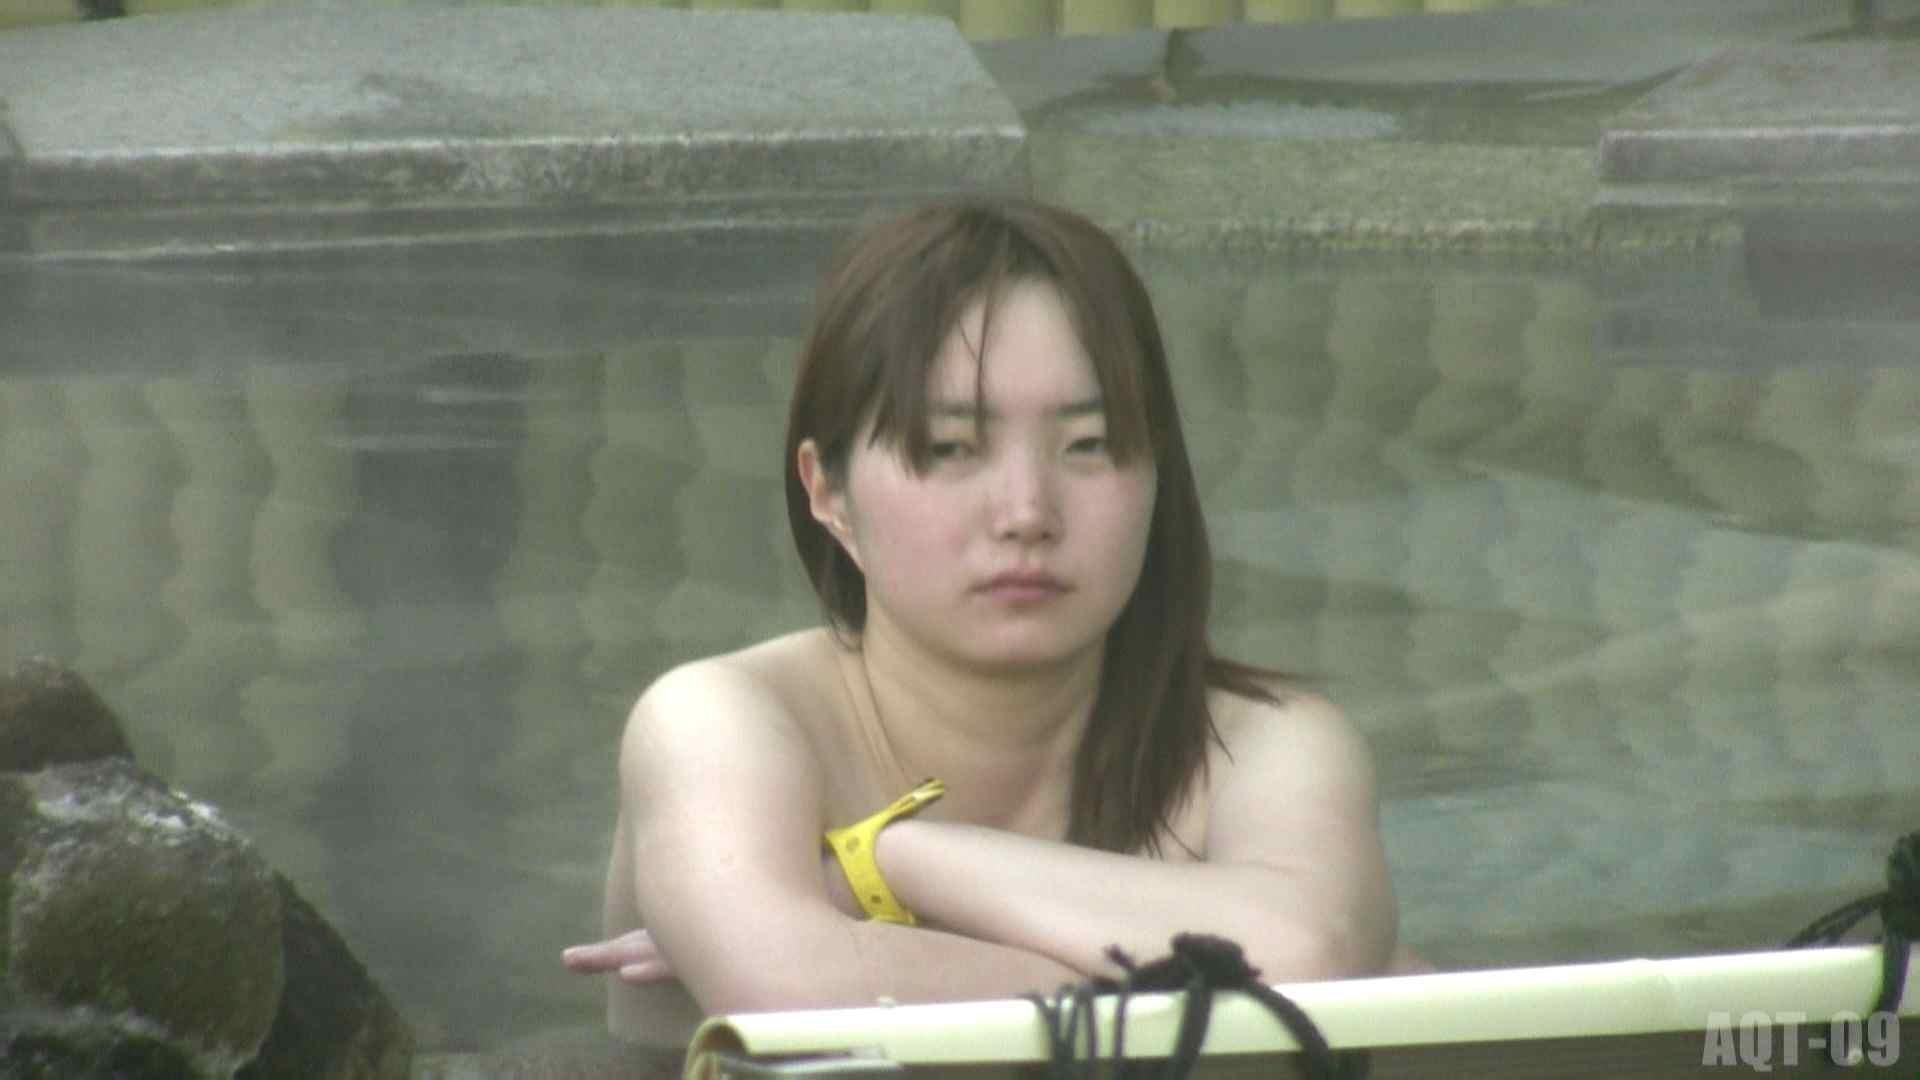 Aquaな露天風呂Vol.781 0  48連発 36